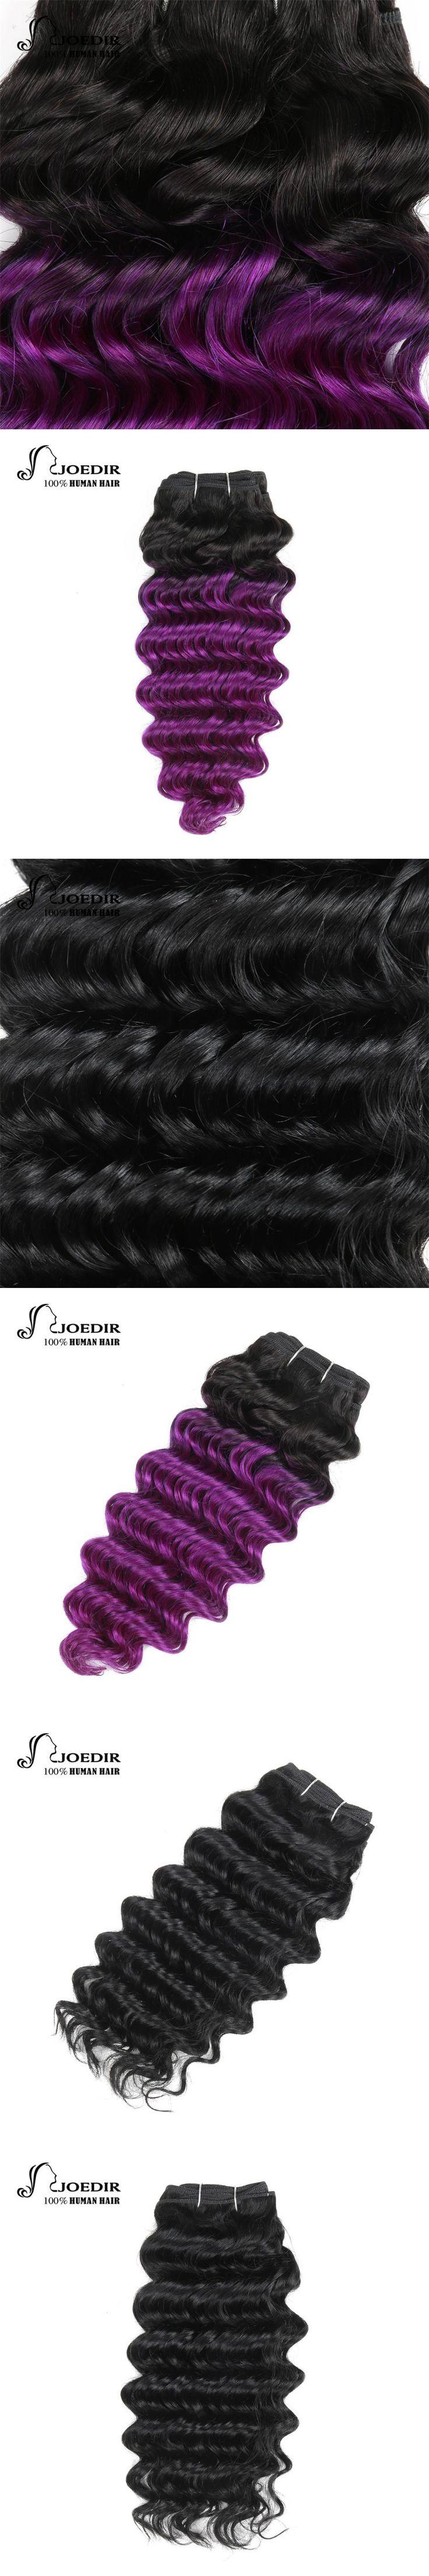 Joedir Hair Pre-Colored Brazilian Remy Human Hair Weave Nature Deep Wave #1 Jet Black Color #T1B-Purple Color Free Shipping